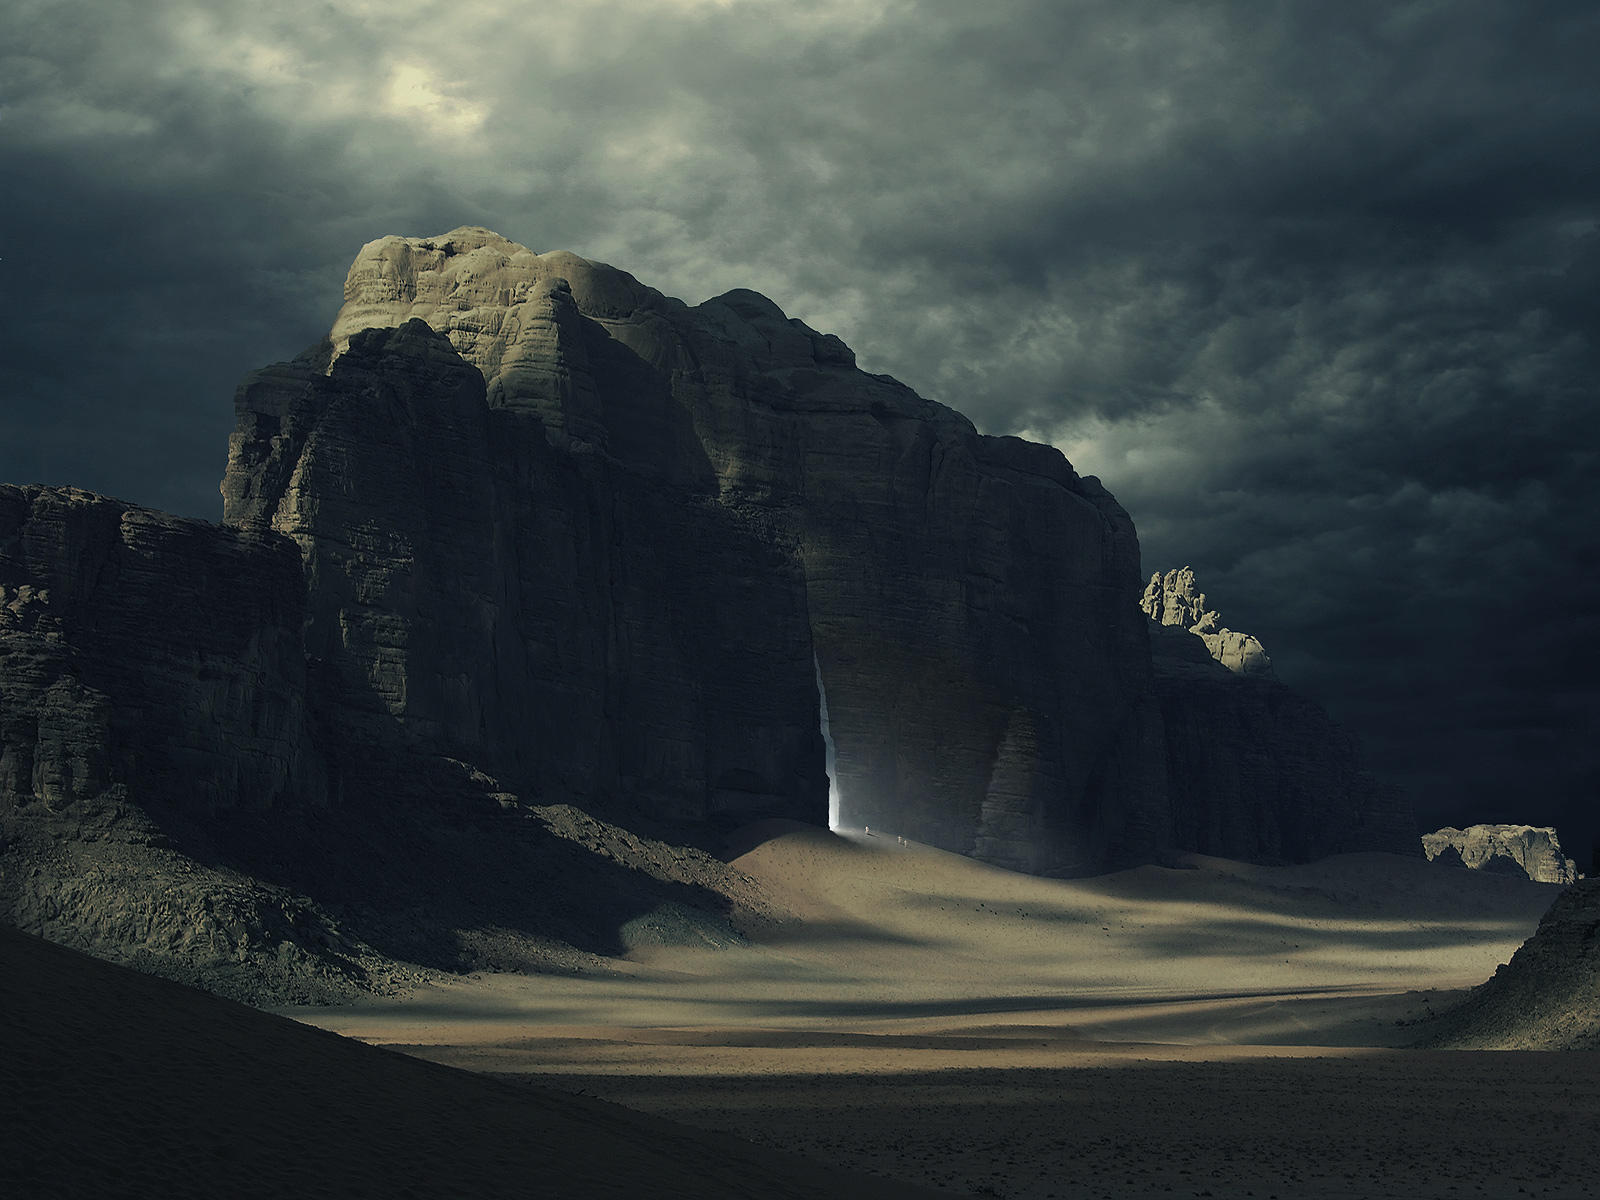 Xanthe Terra Wallp by Karezoid